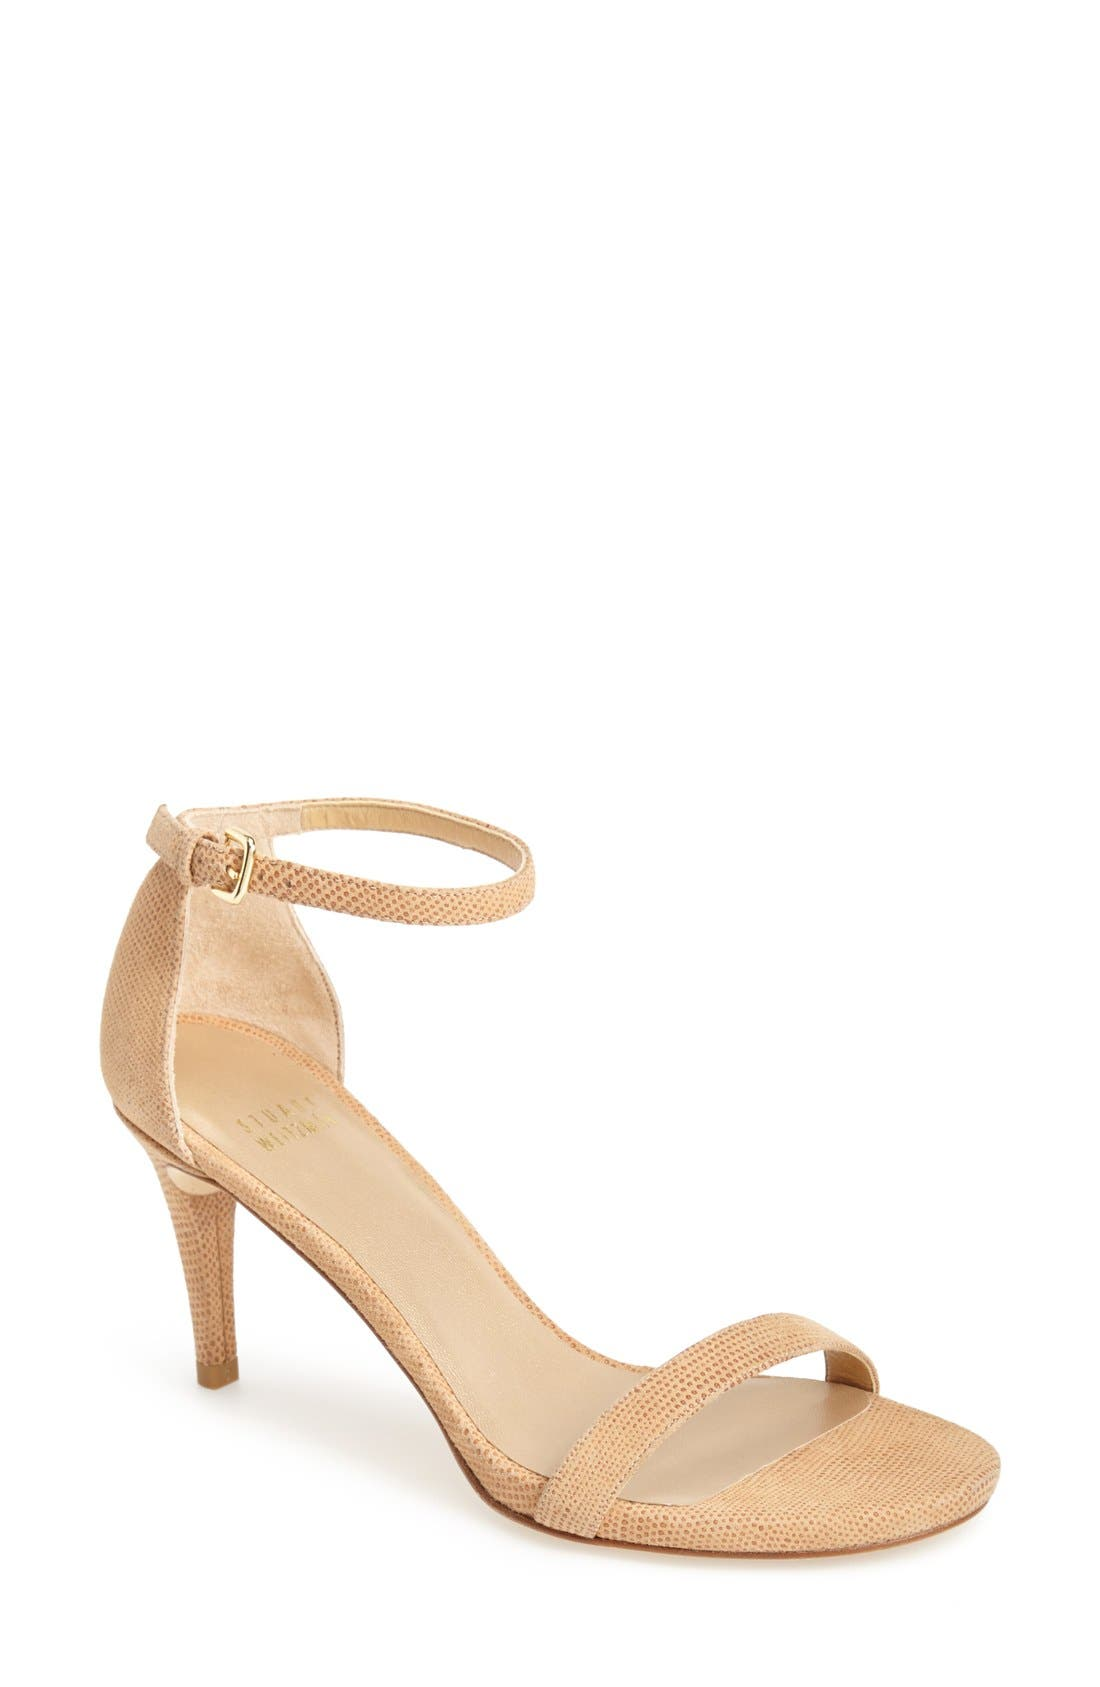 Alternate Image 1 Selected - Stuart Weitzman 'Nunaked' Leather Ankle Strap Sandal (Women)